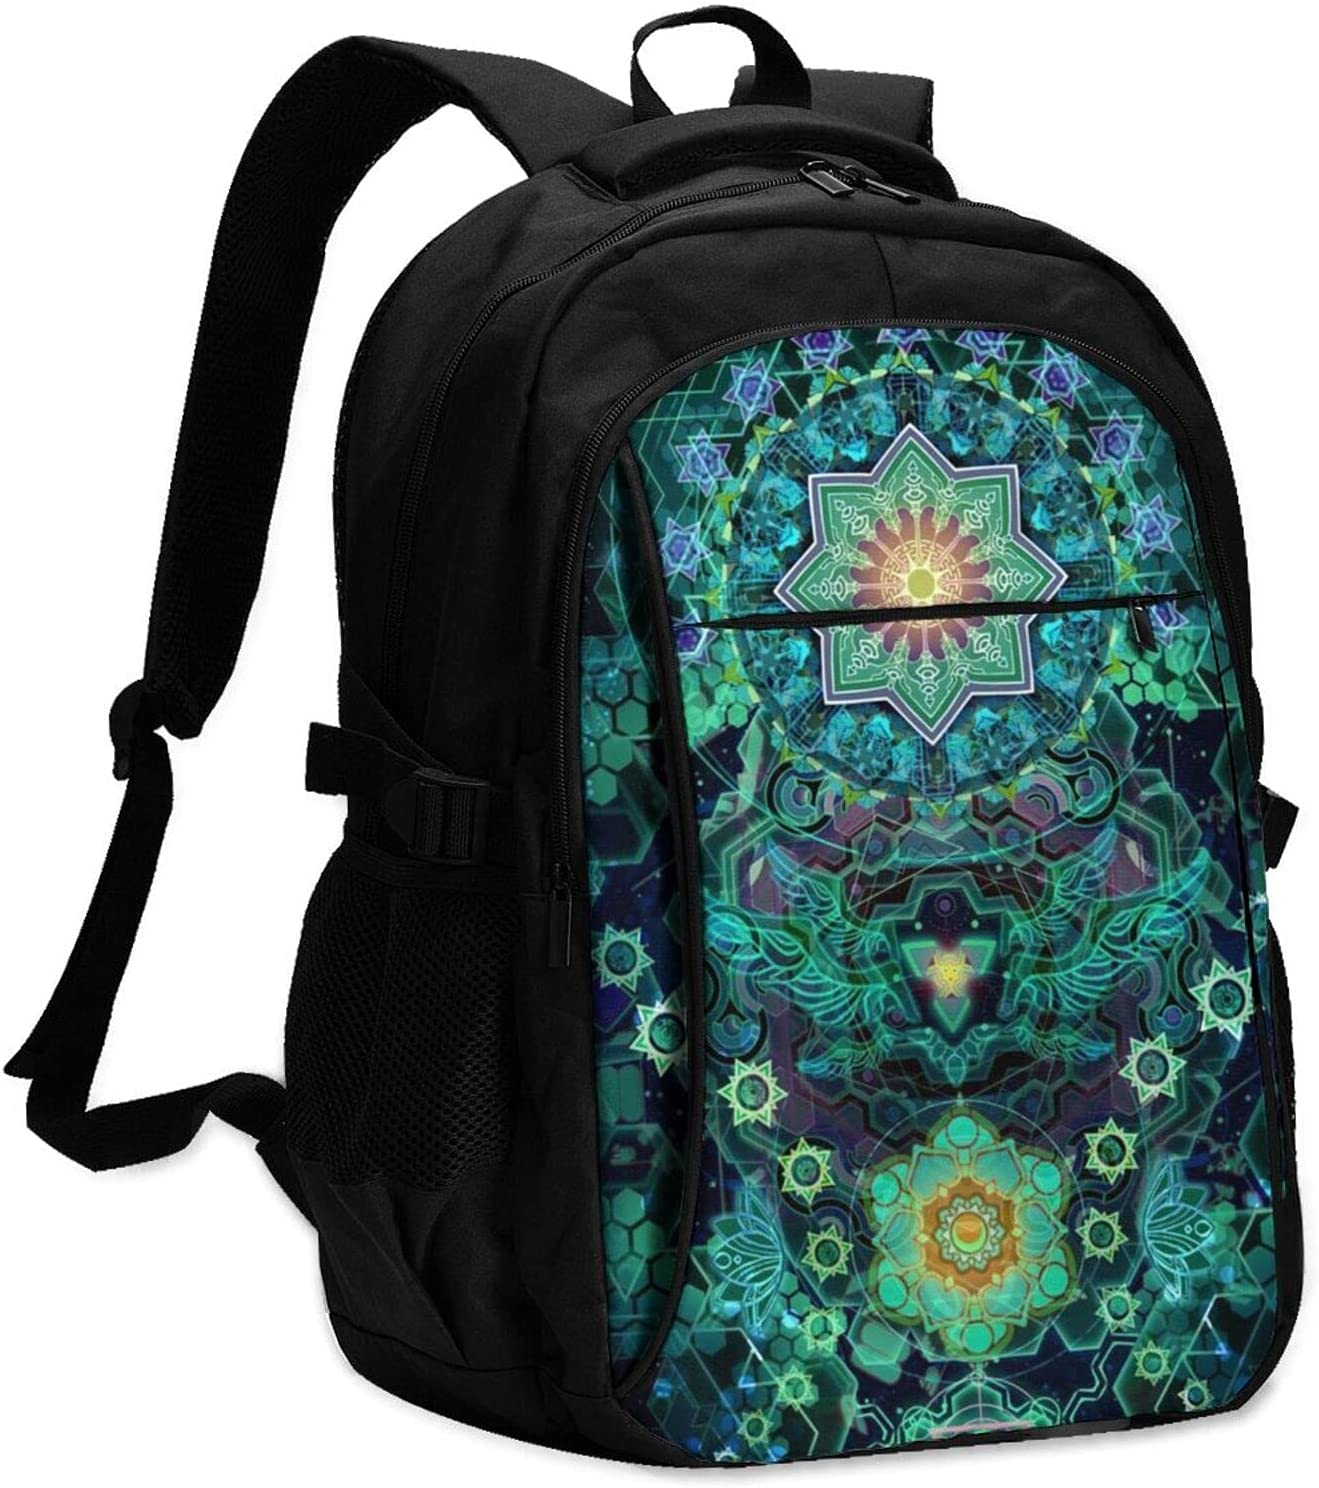 YAZXHJAZ Brand new Backpack with USB Milwaukee Mall Laptop School 17 Travel Bag